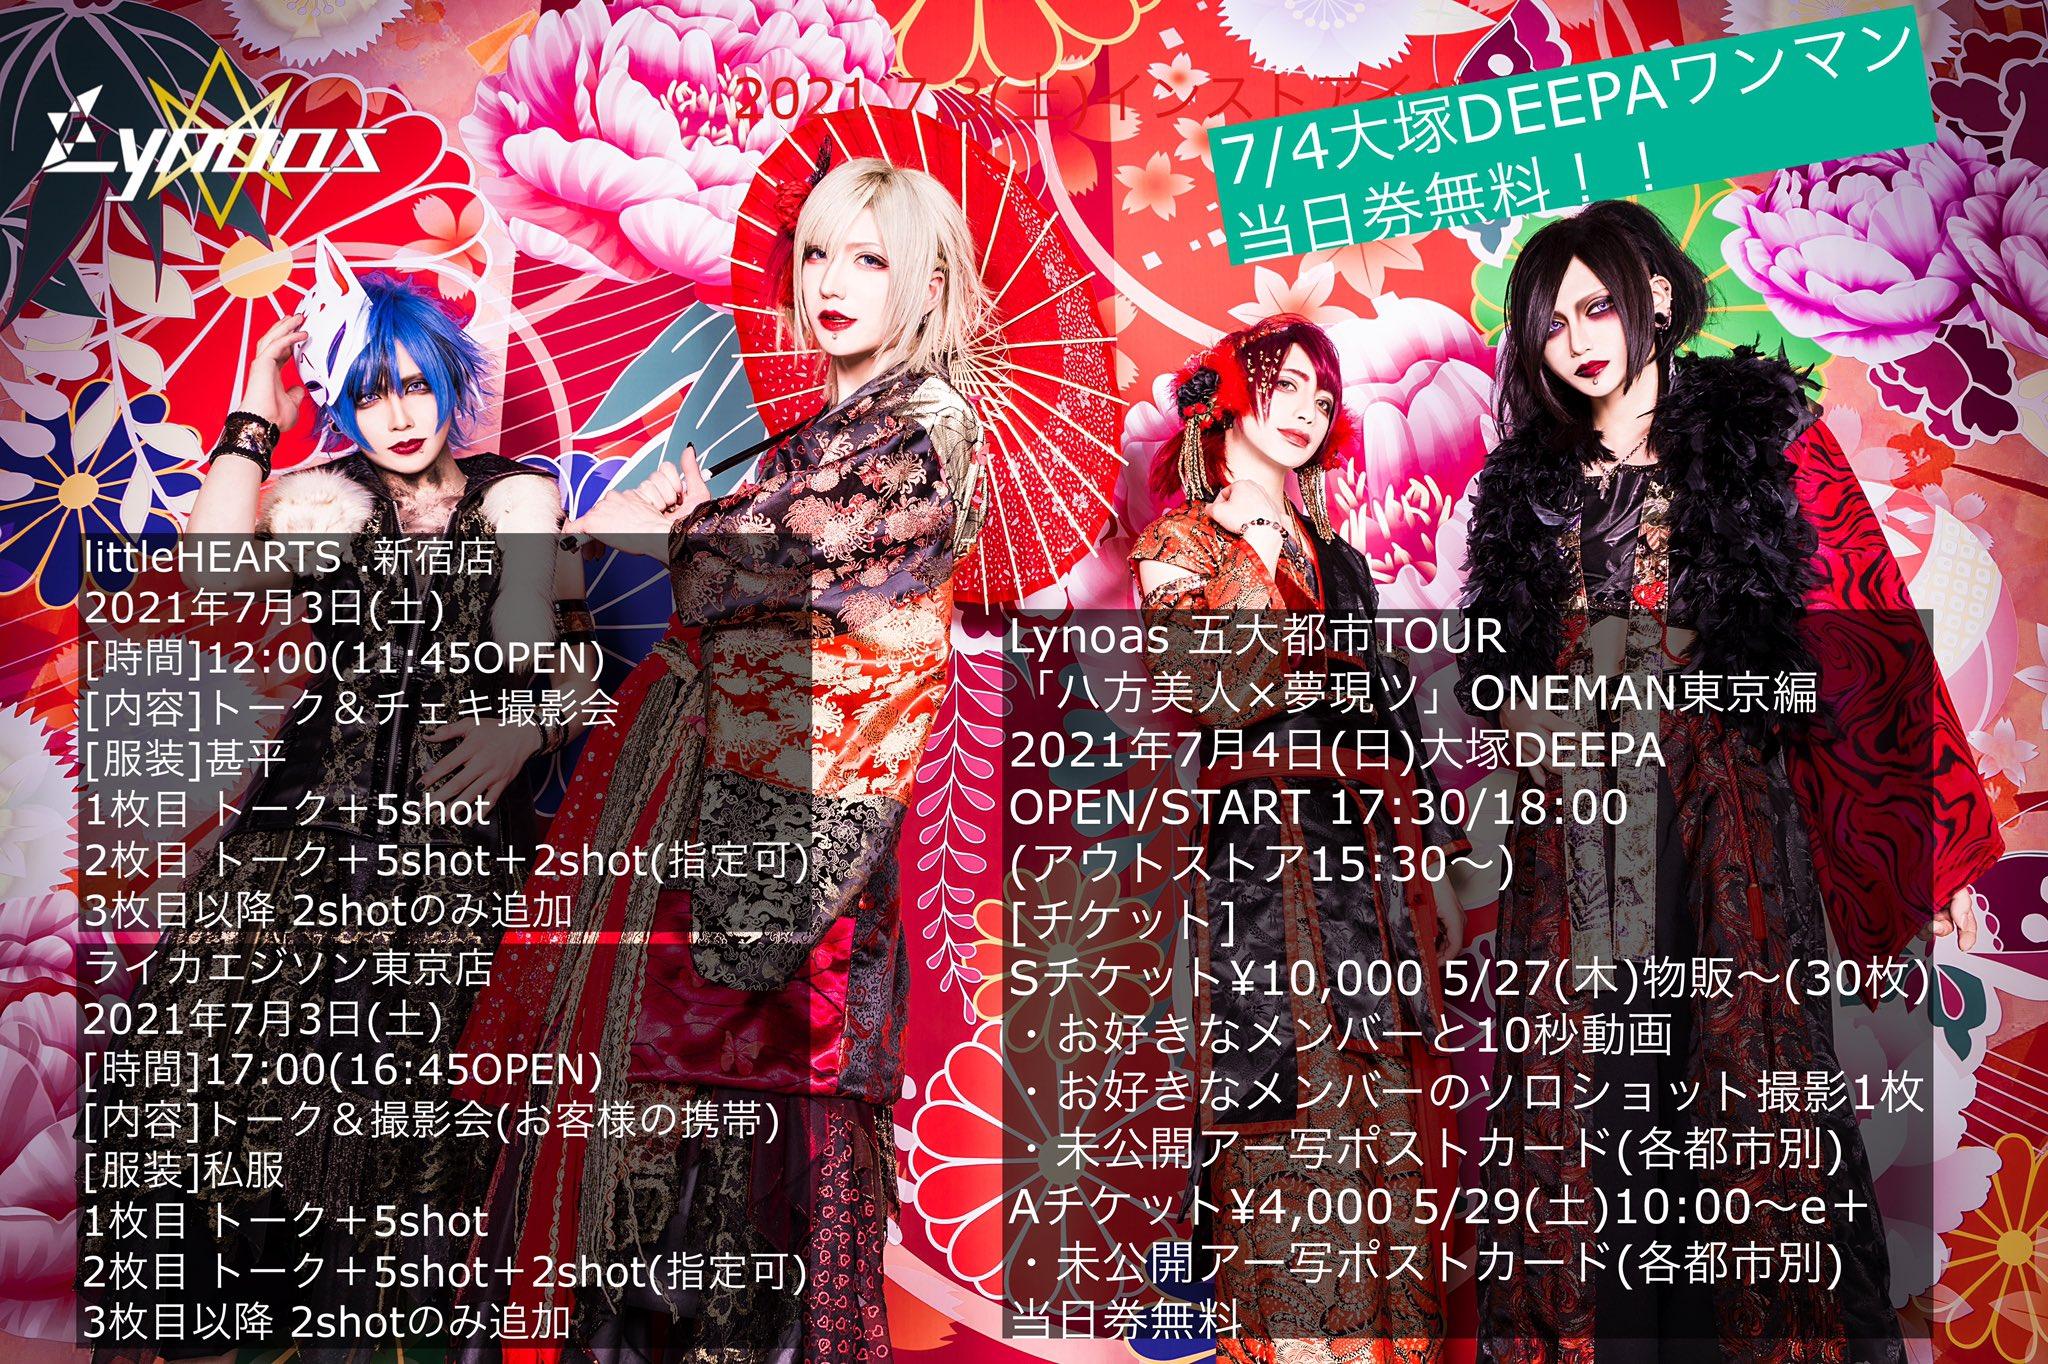 Lynoas 五大都市TOUR「ハ方美人×夢現ツ」ONEMAN東京編